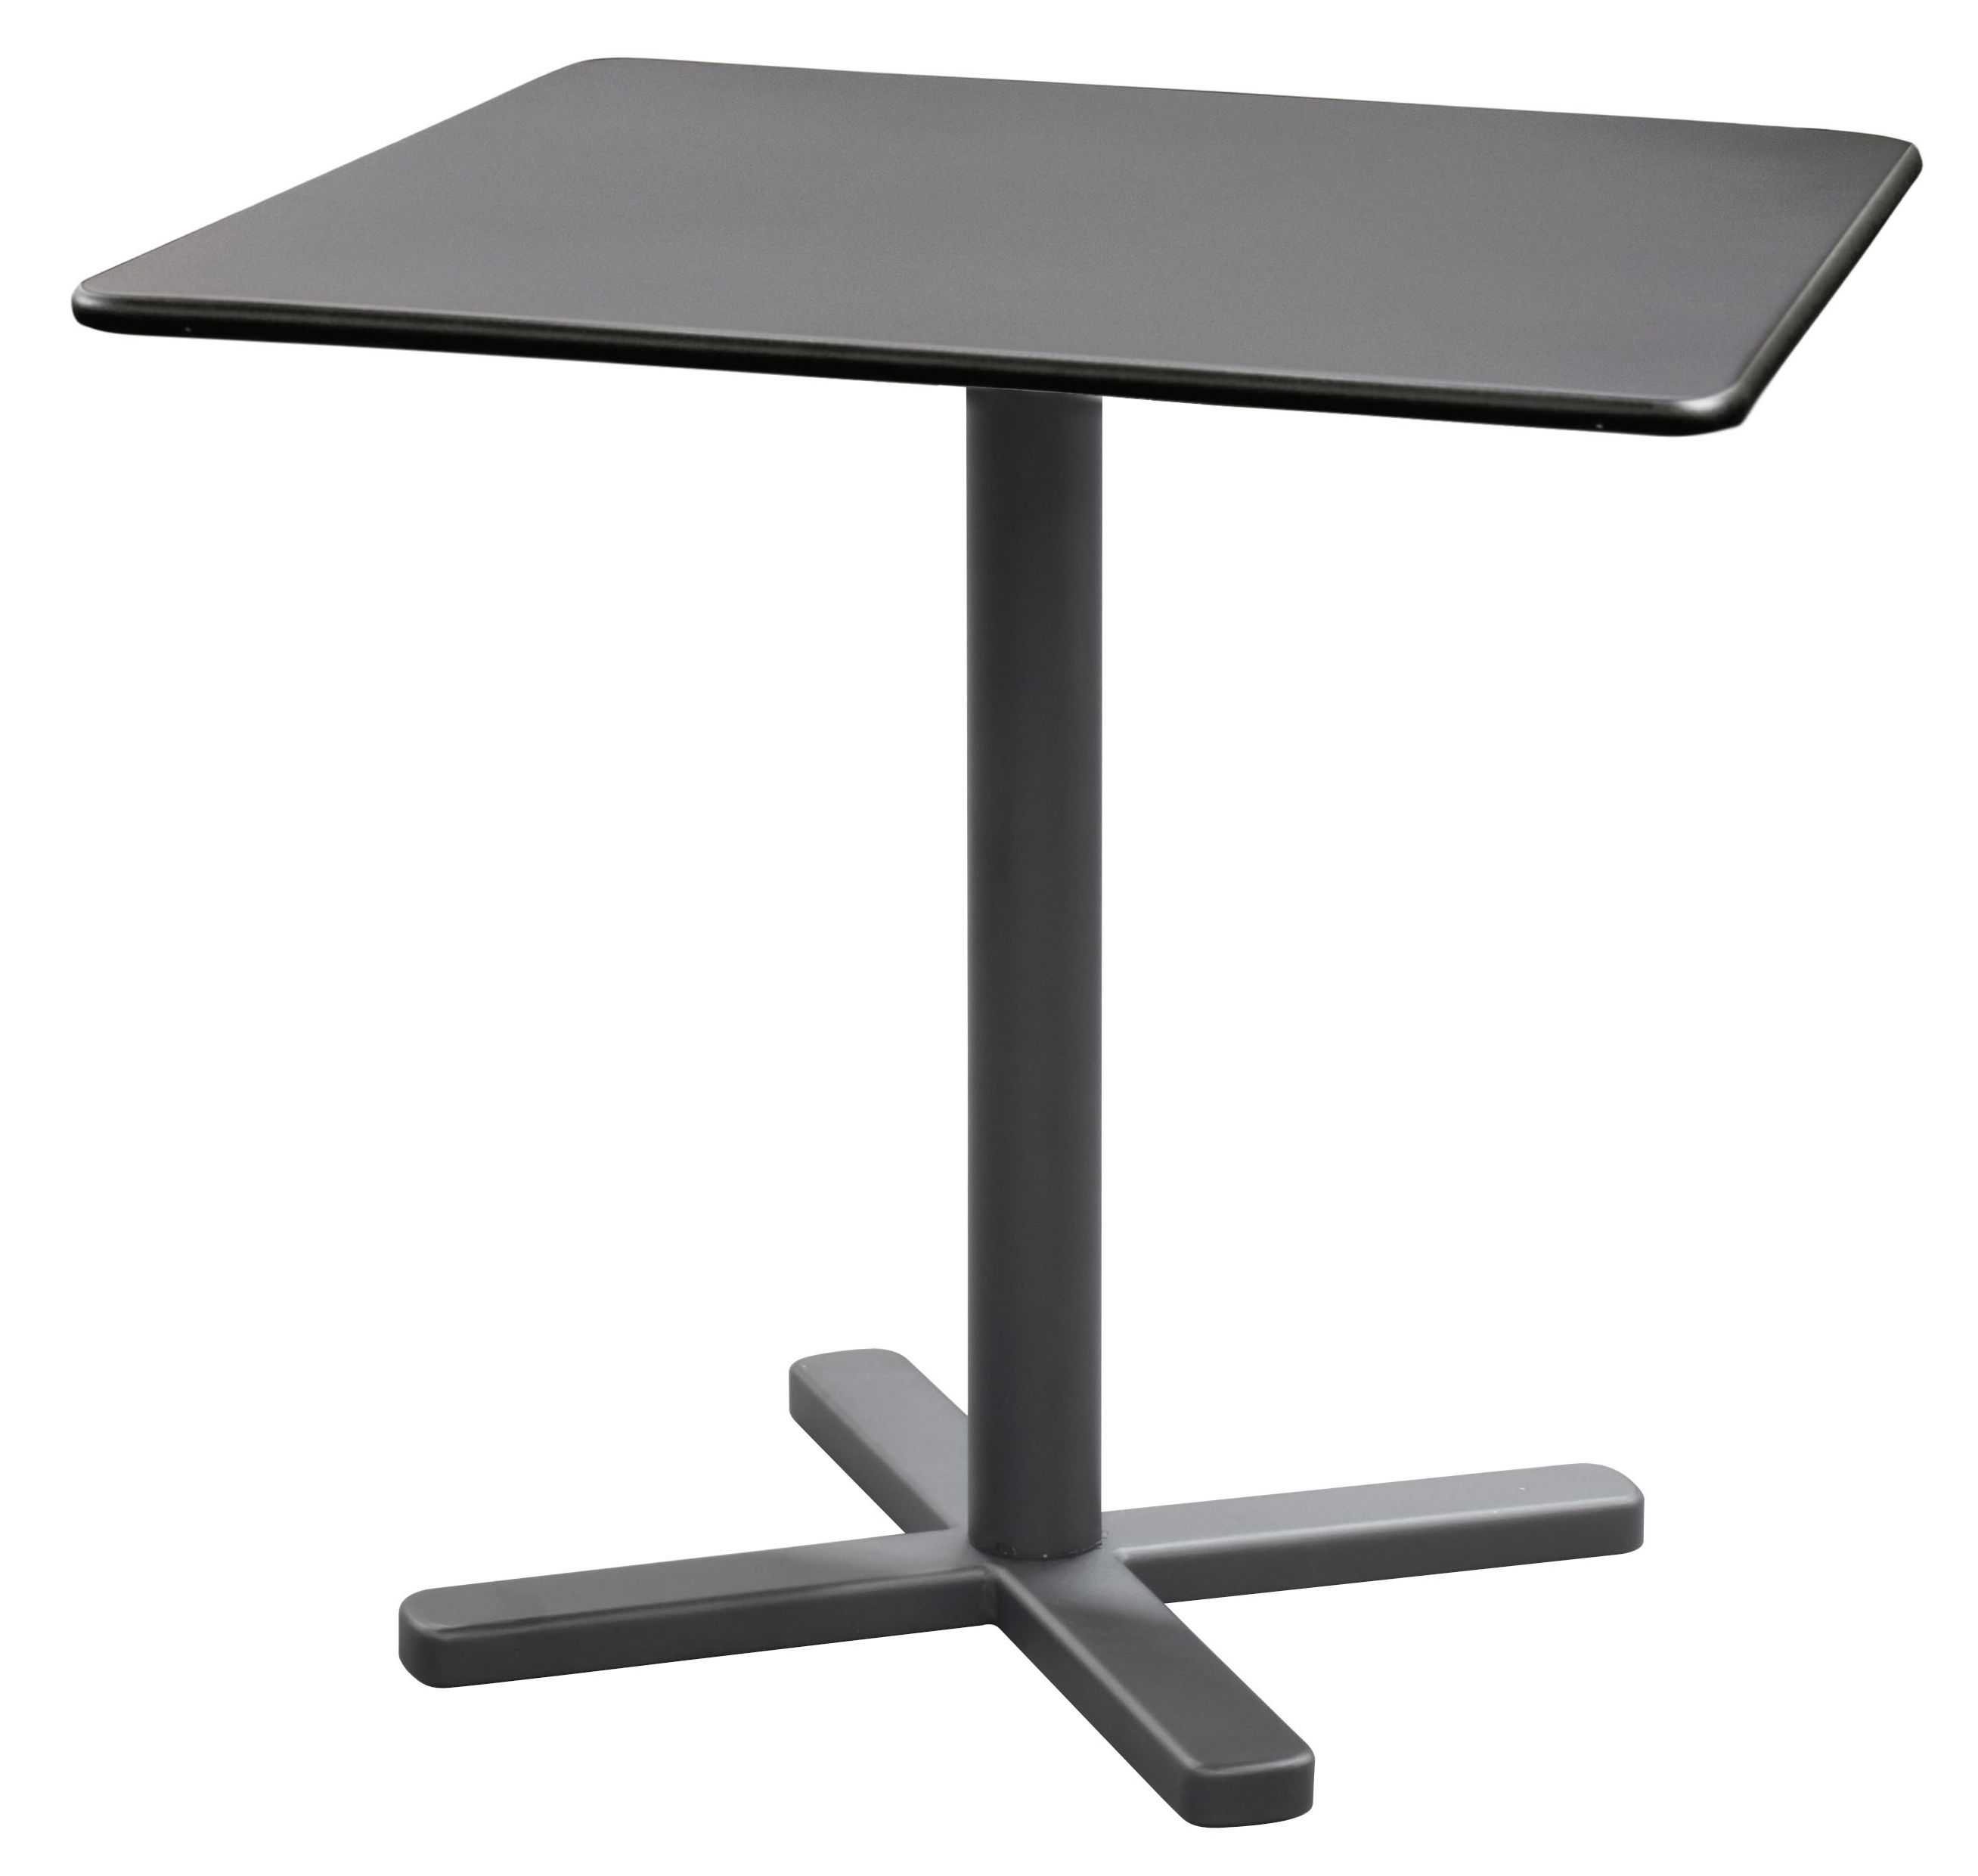 table pliante darwin 80 x 80 cm fer ancien emu. Black Bedroom Furniture Sets. Home Design Ideas